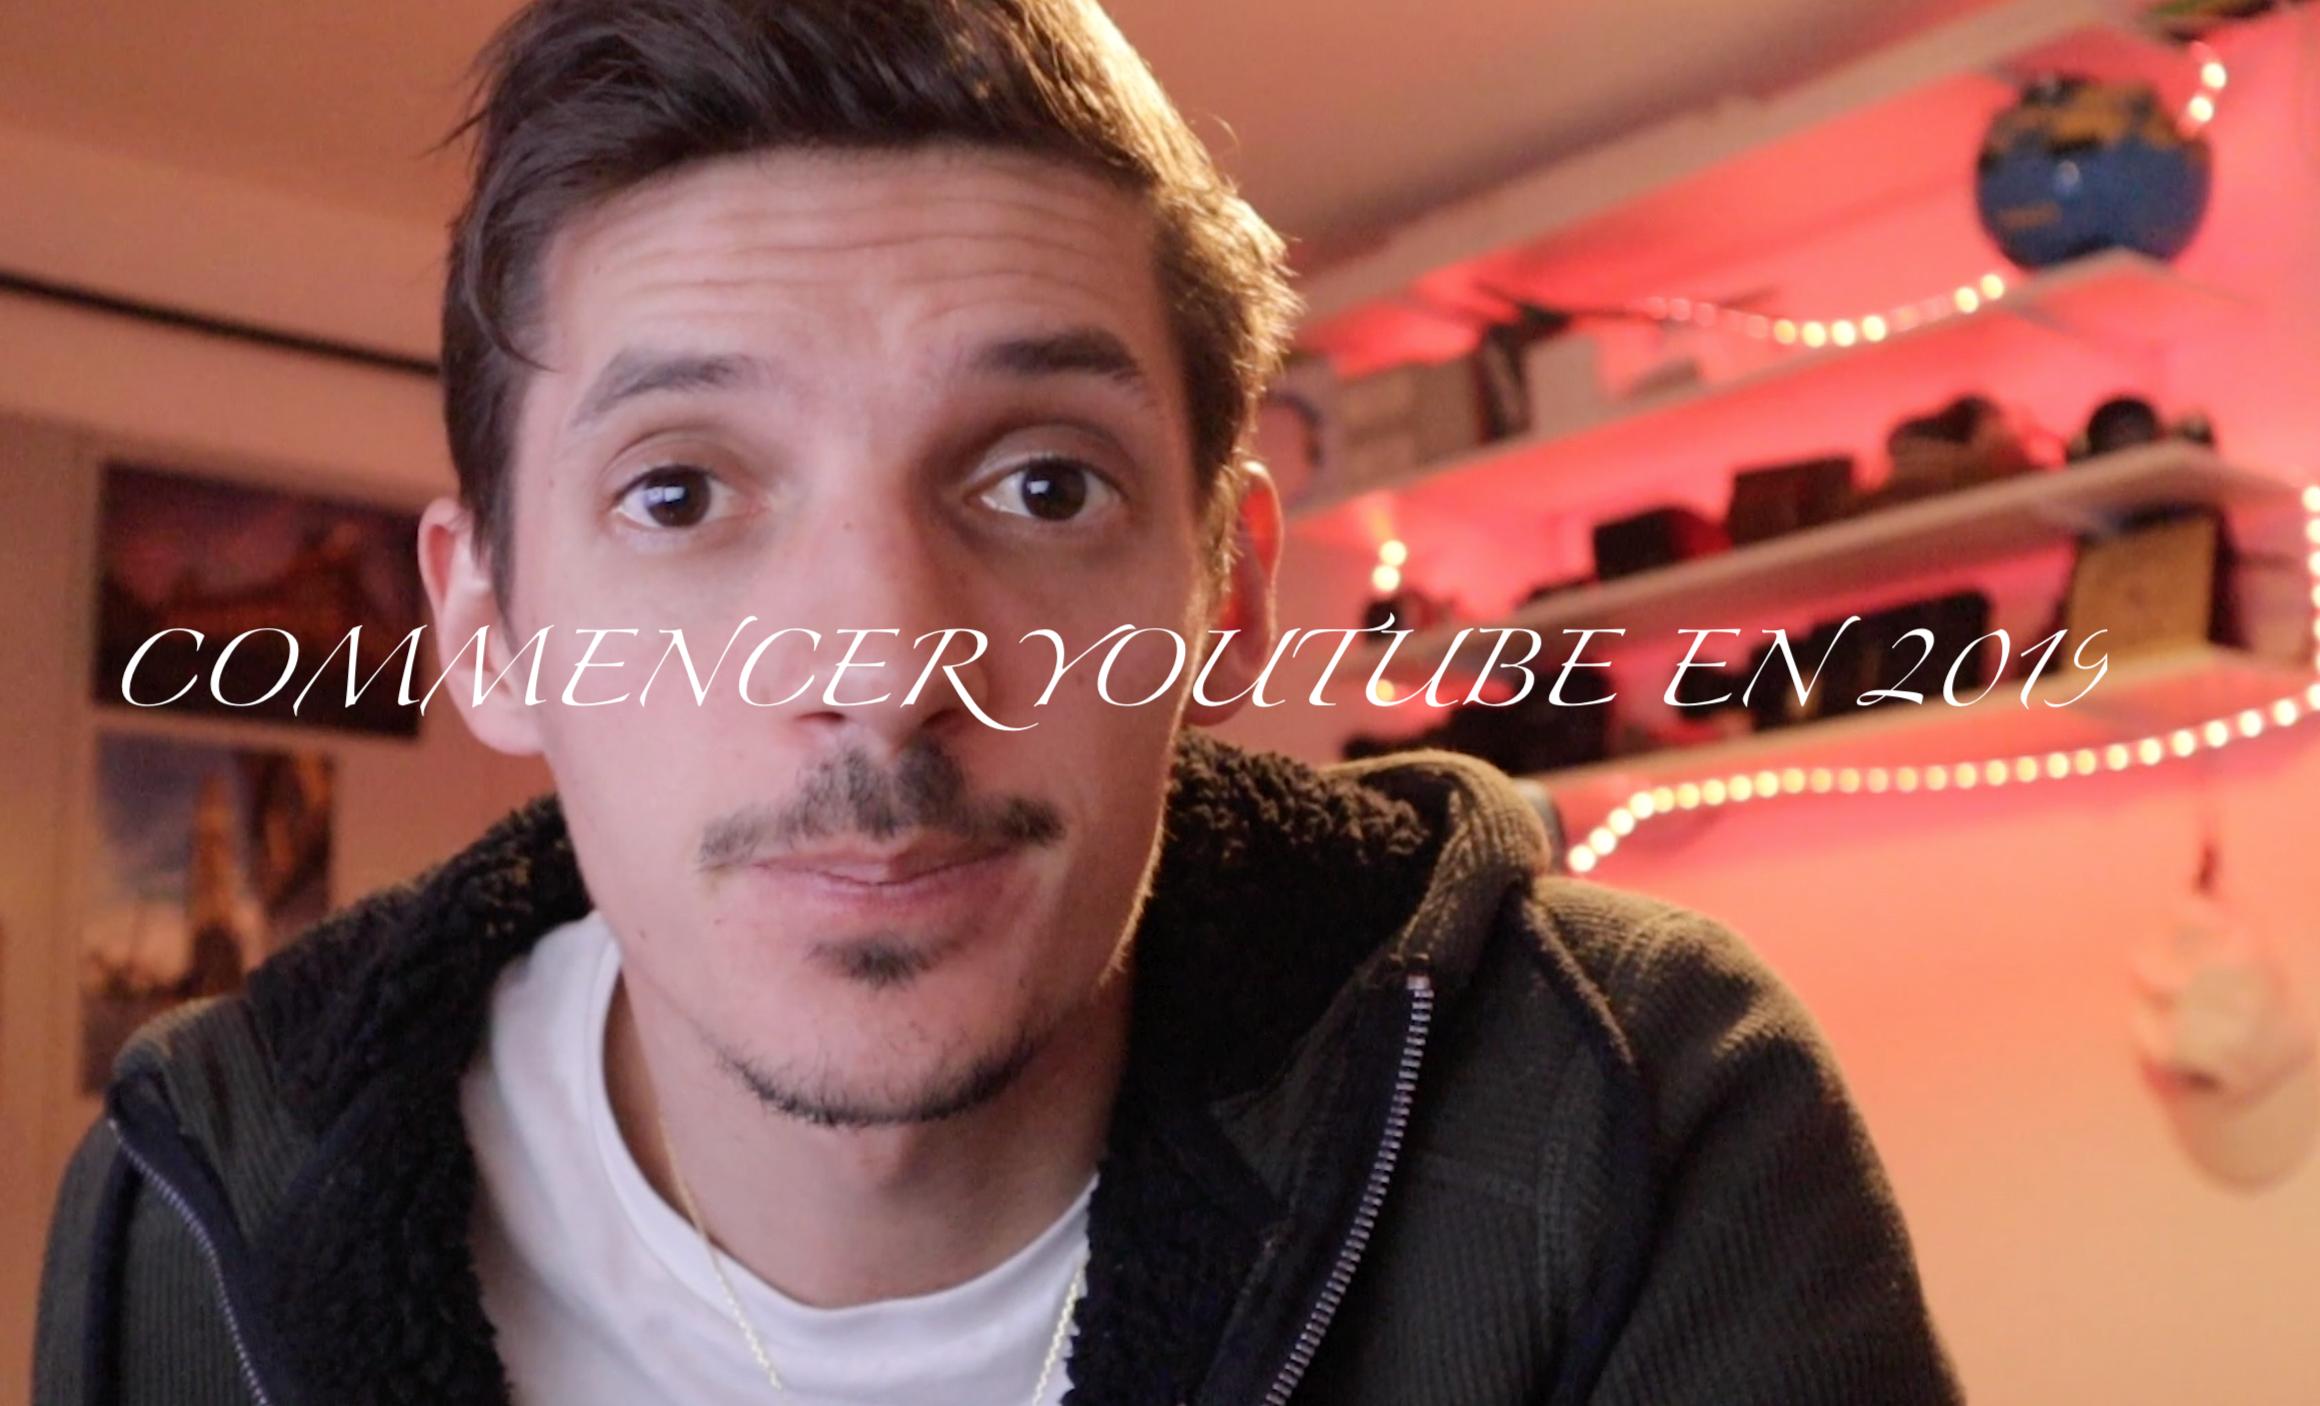 Commencer youtube en 2019